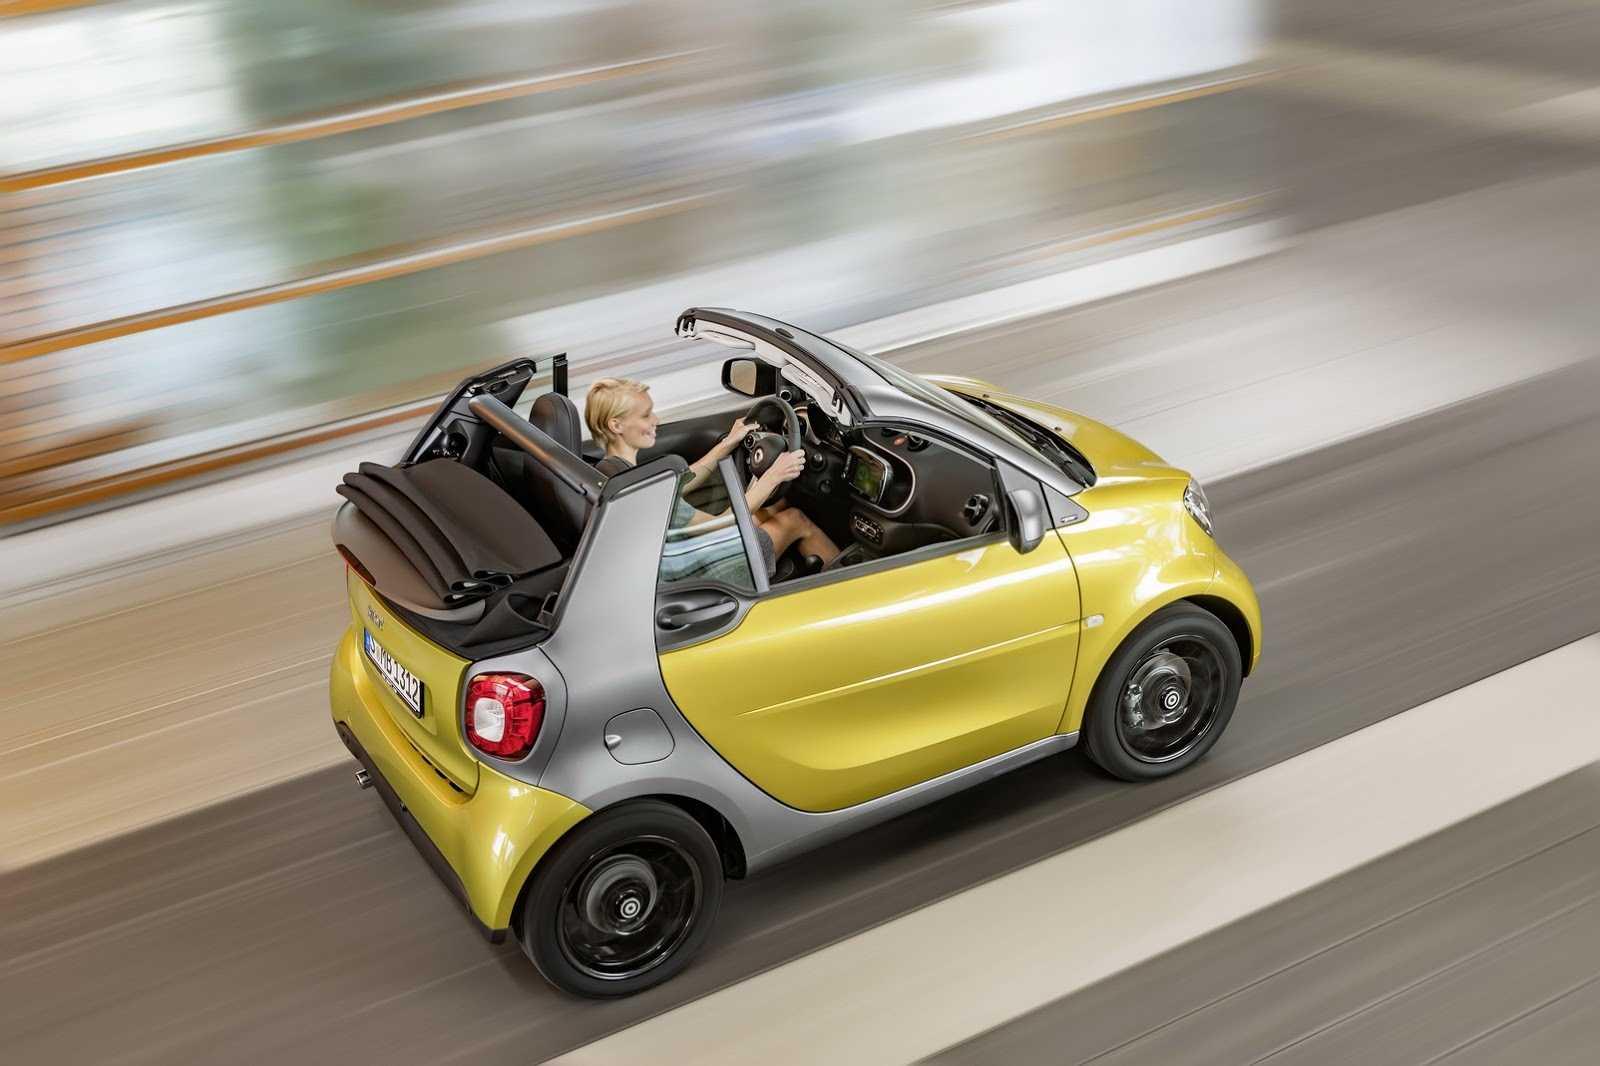 Smart fortwo cabrio привезут во франкфурт - «автоновости» » авто - новости